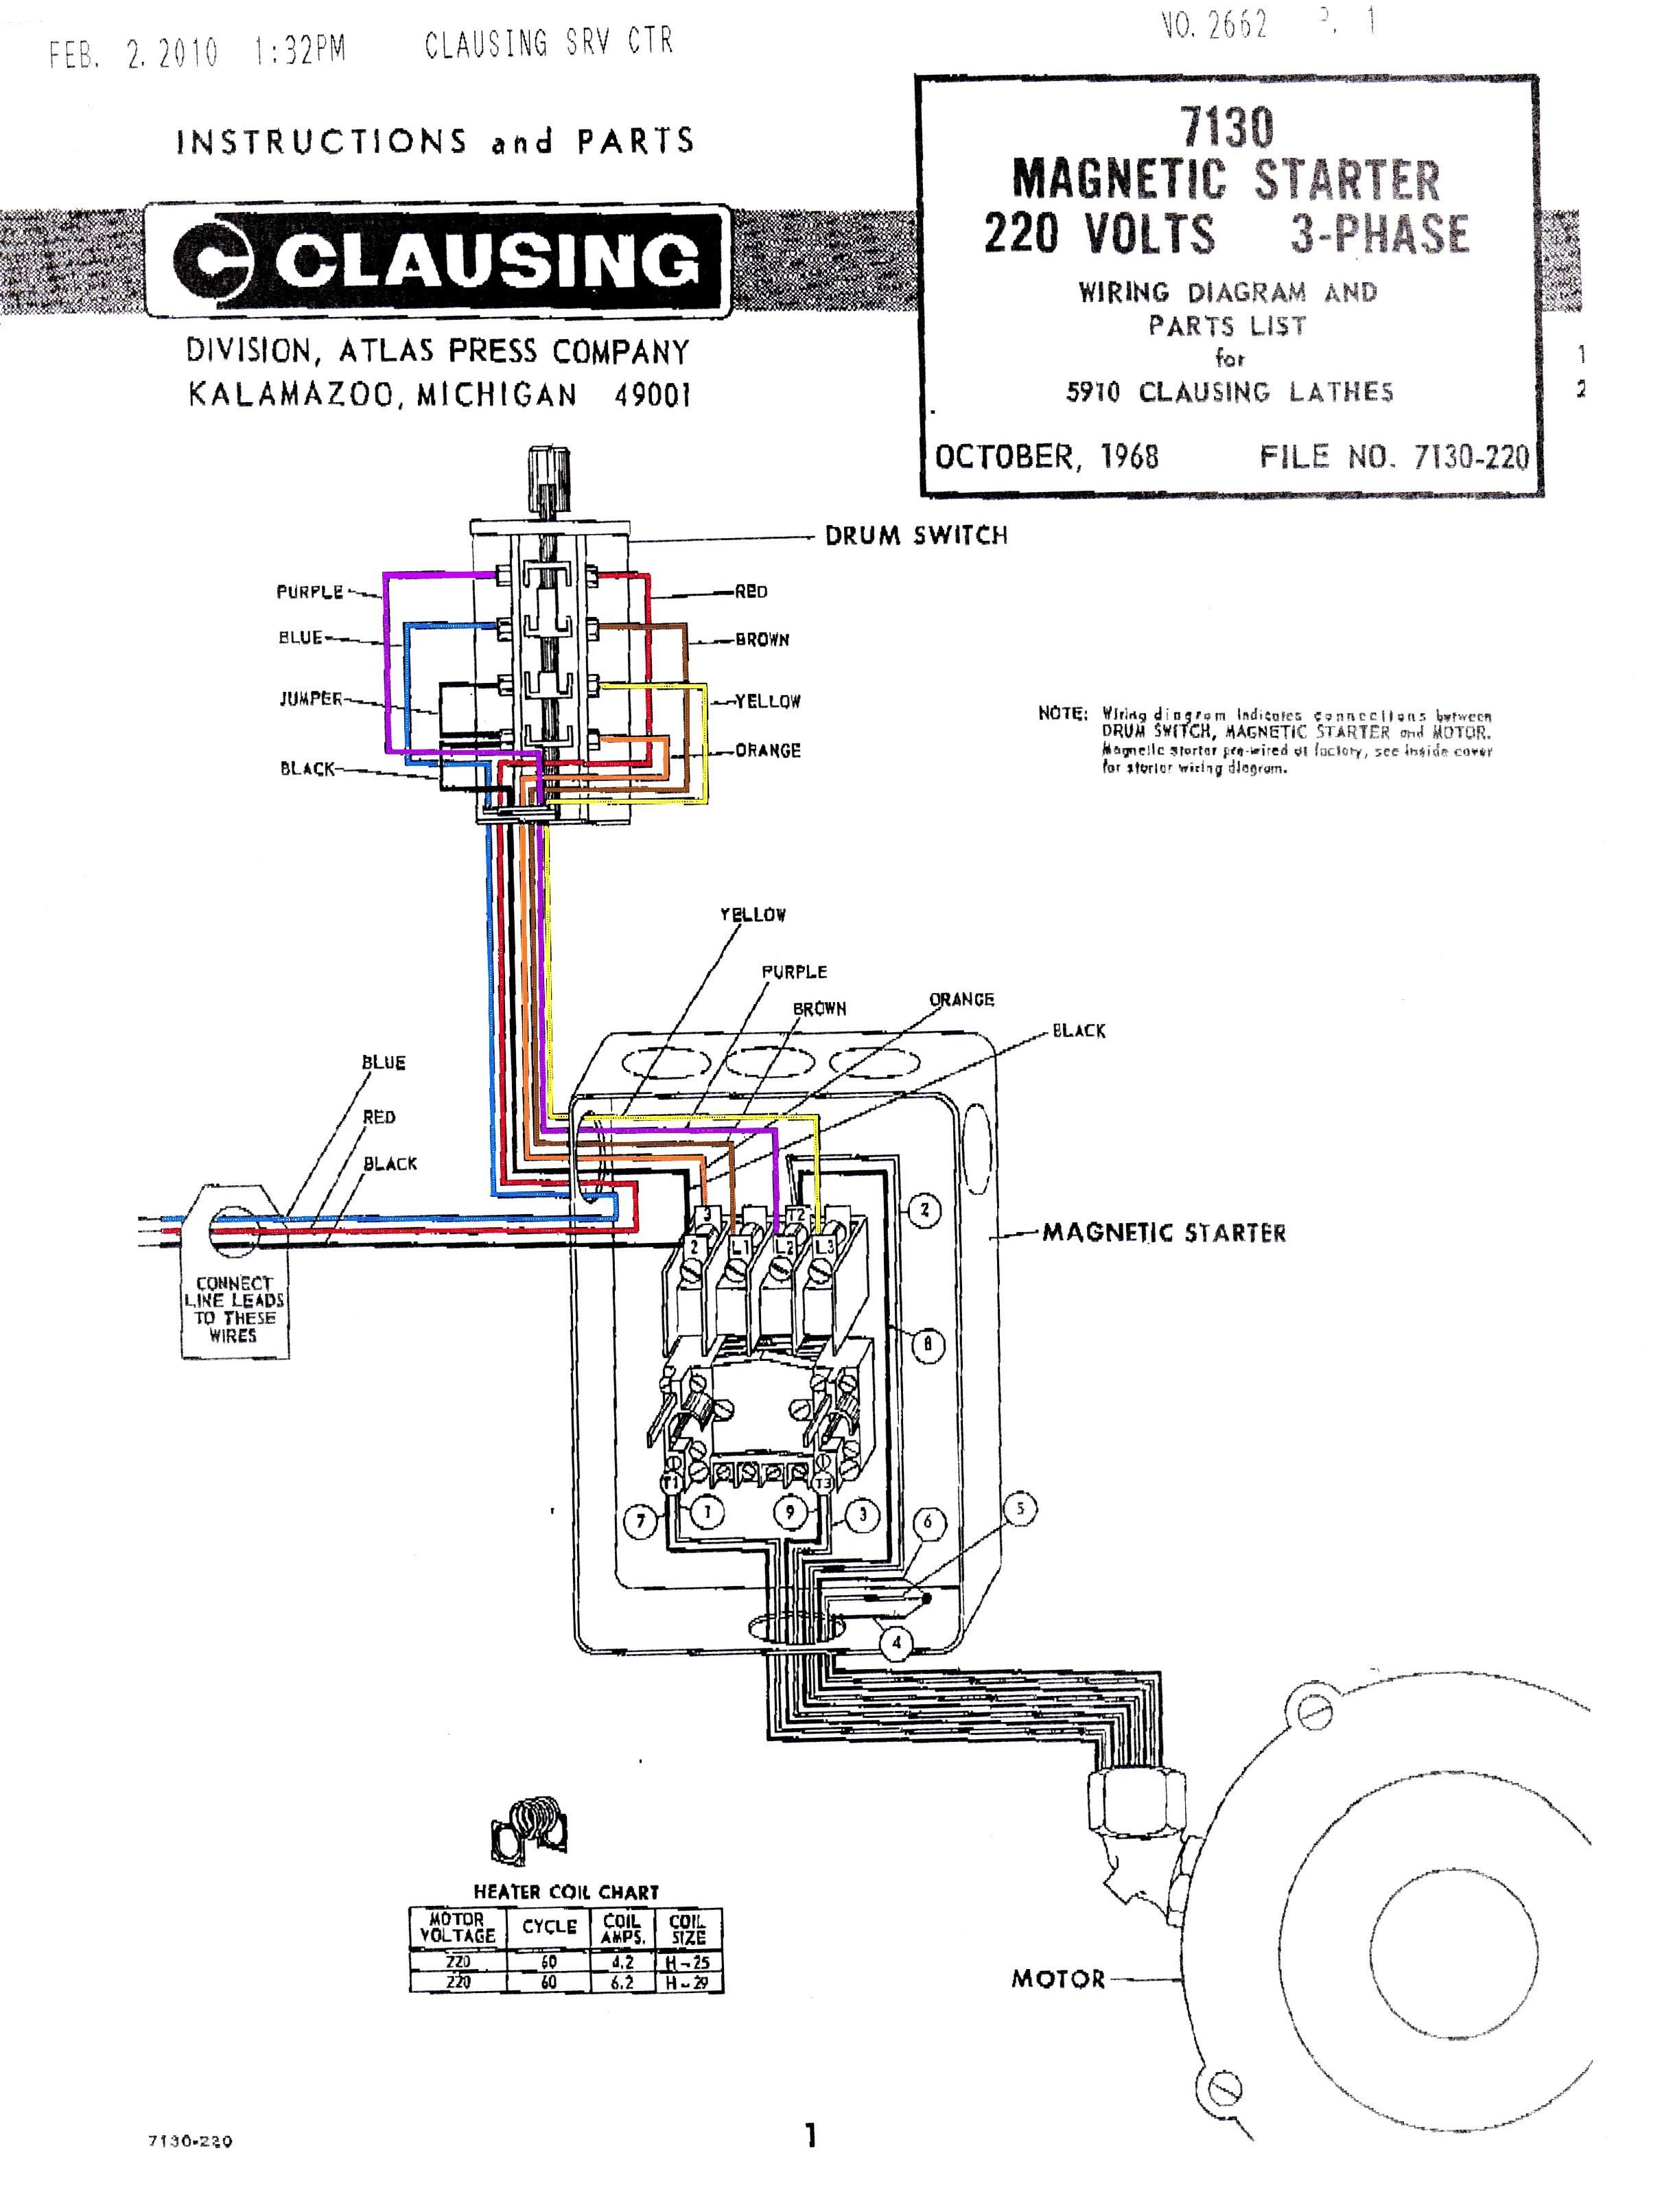 mechanically held lighting contactor wiring diagram contactor wiring diagram 220 opinions about wiring diagram e280a2 of mechanically held lighting contactor wiring diagram mechanically held lighting contactor wiring diagram my wiring diagram